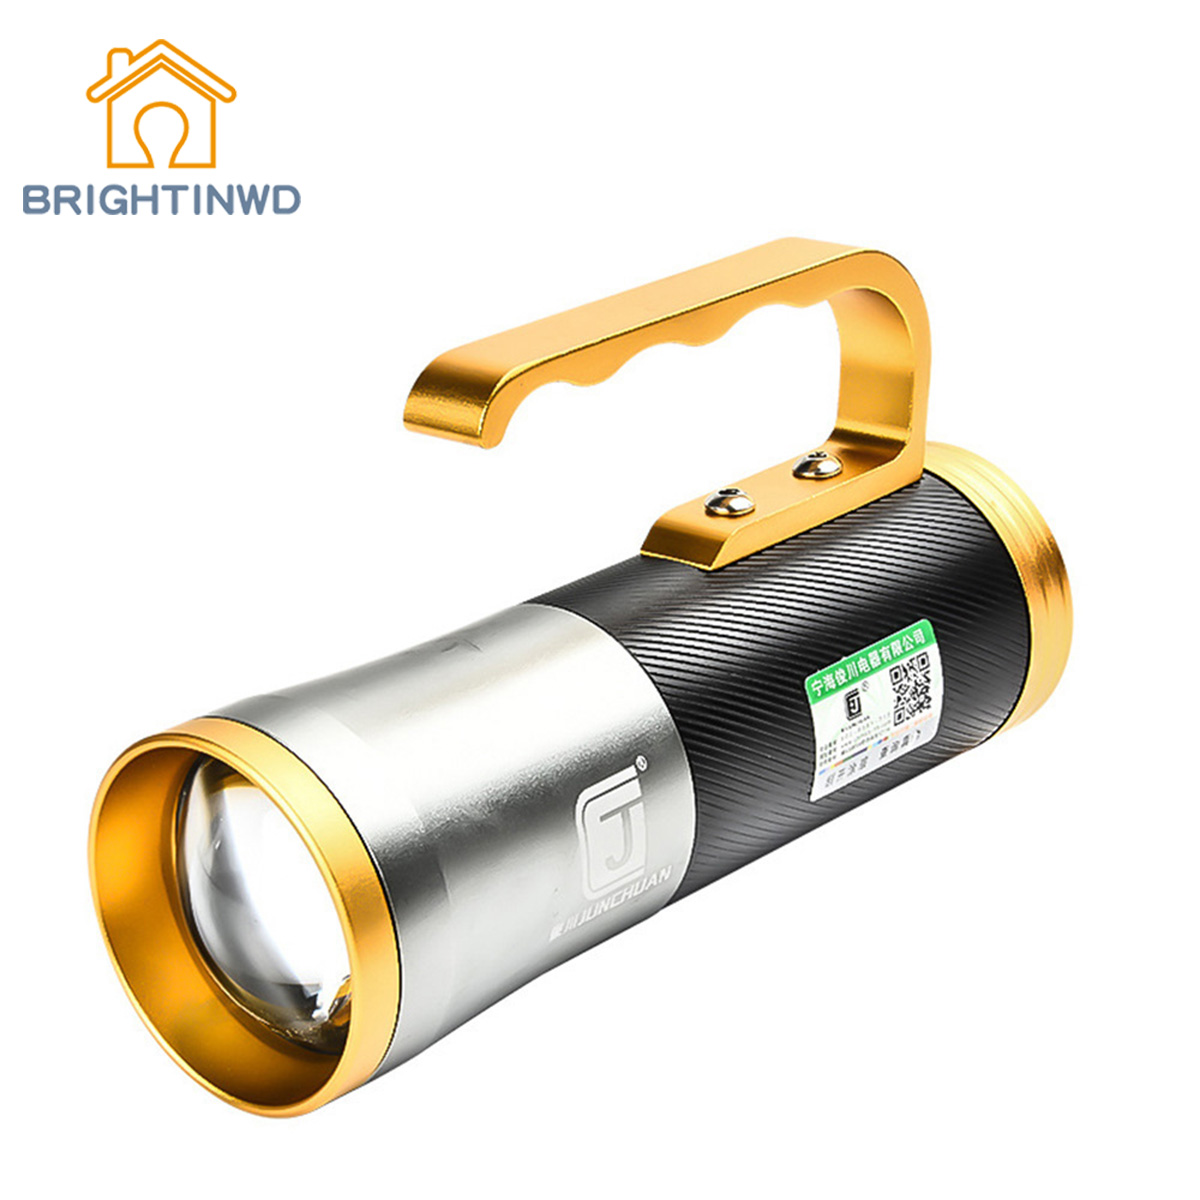 BRIGHTINWD Portable Lantern Flashlight 30W Lantern Campfire Luminarias Outdoor Camping Flashlight Lantern Searchlight Camp Light fenix cl20 outdoor light lantern